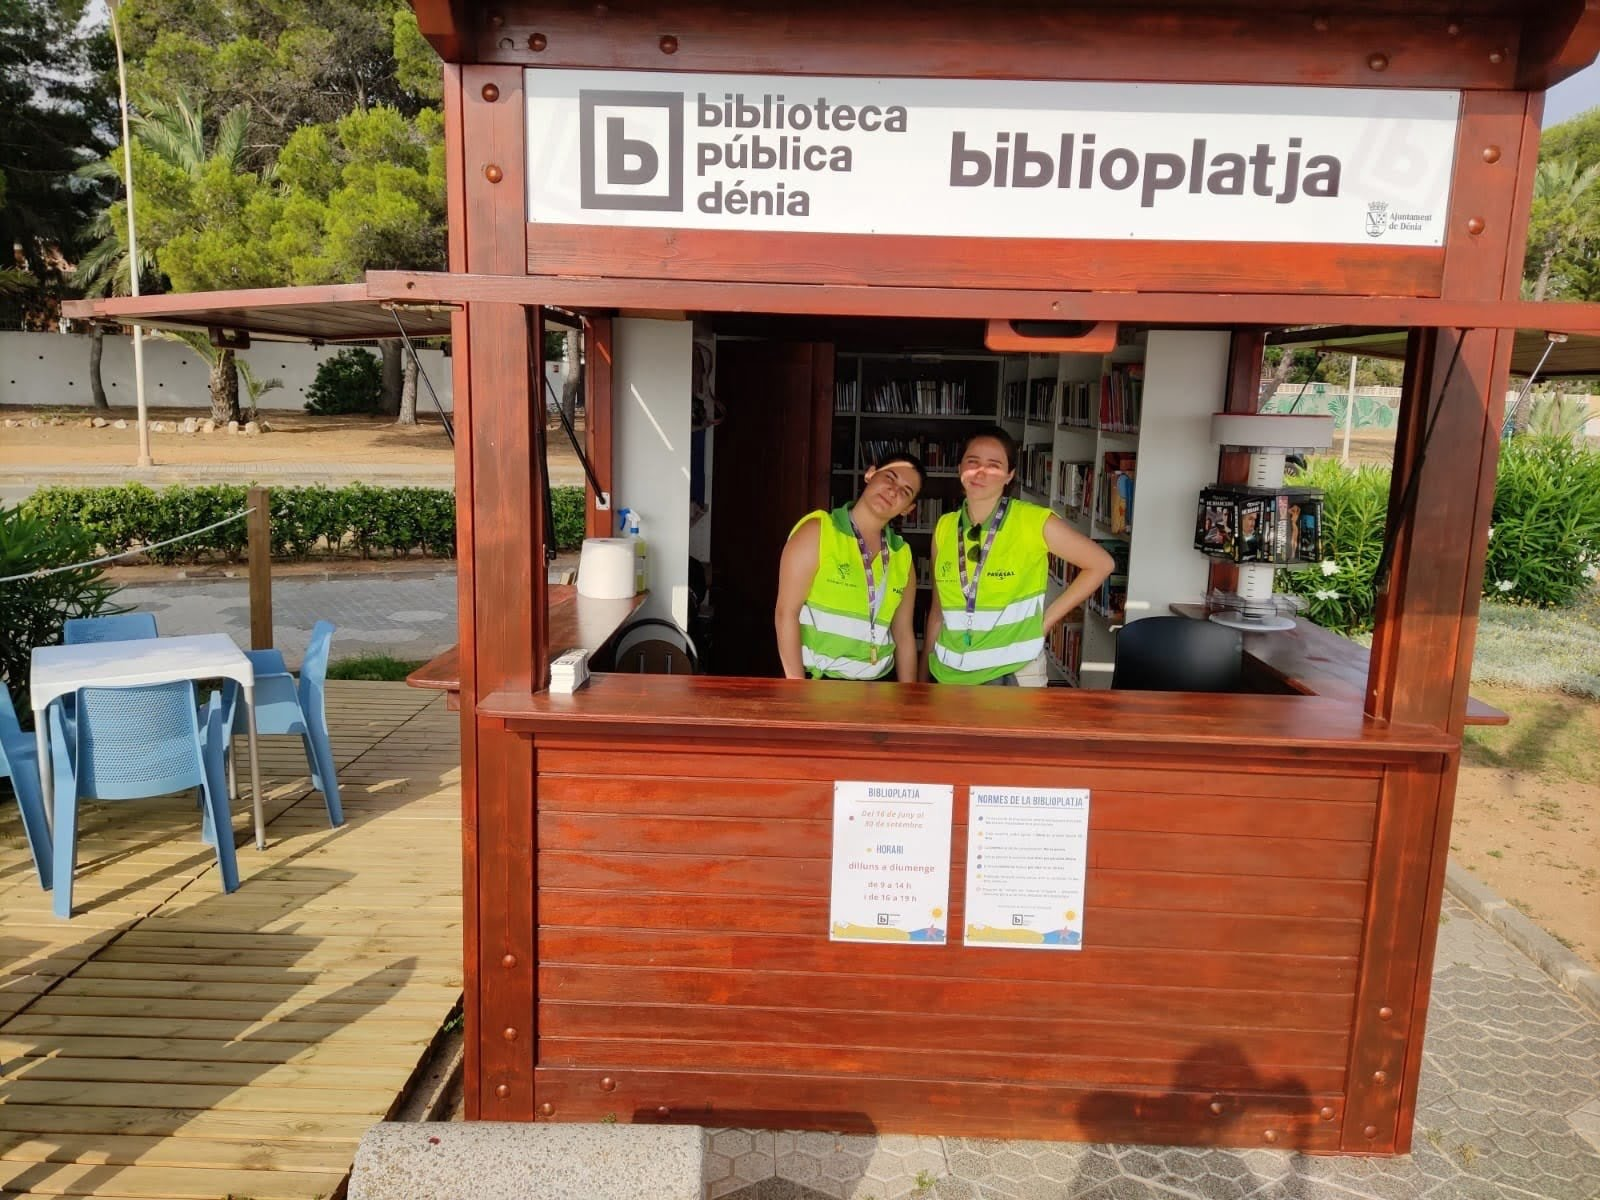 Trabajadoras de la nueva Biblioplatja